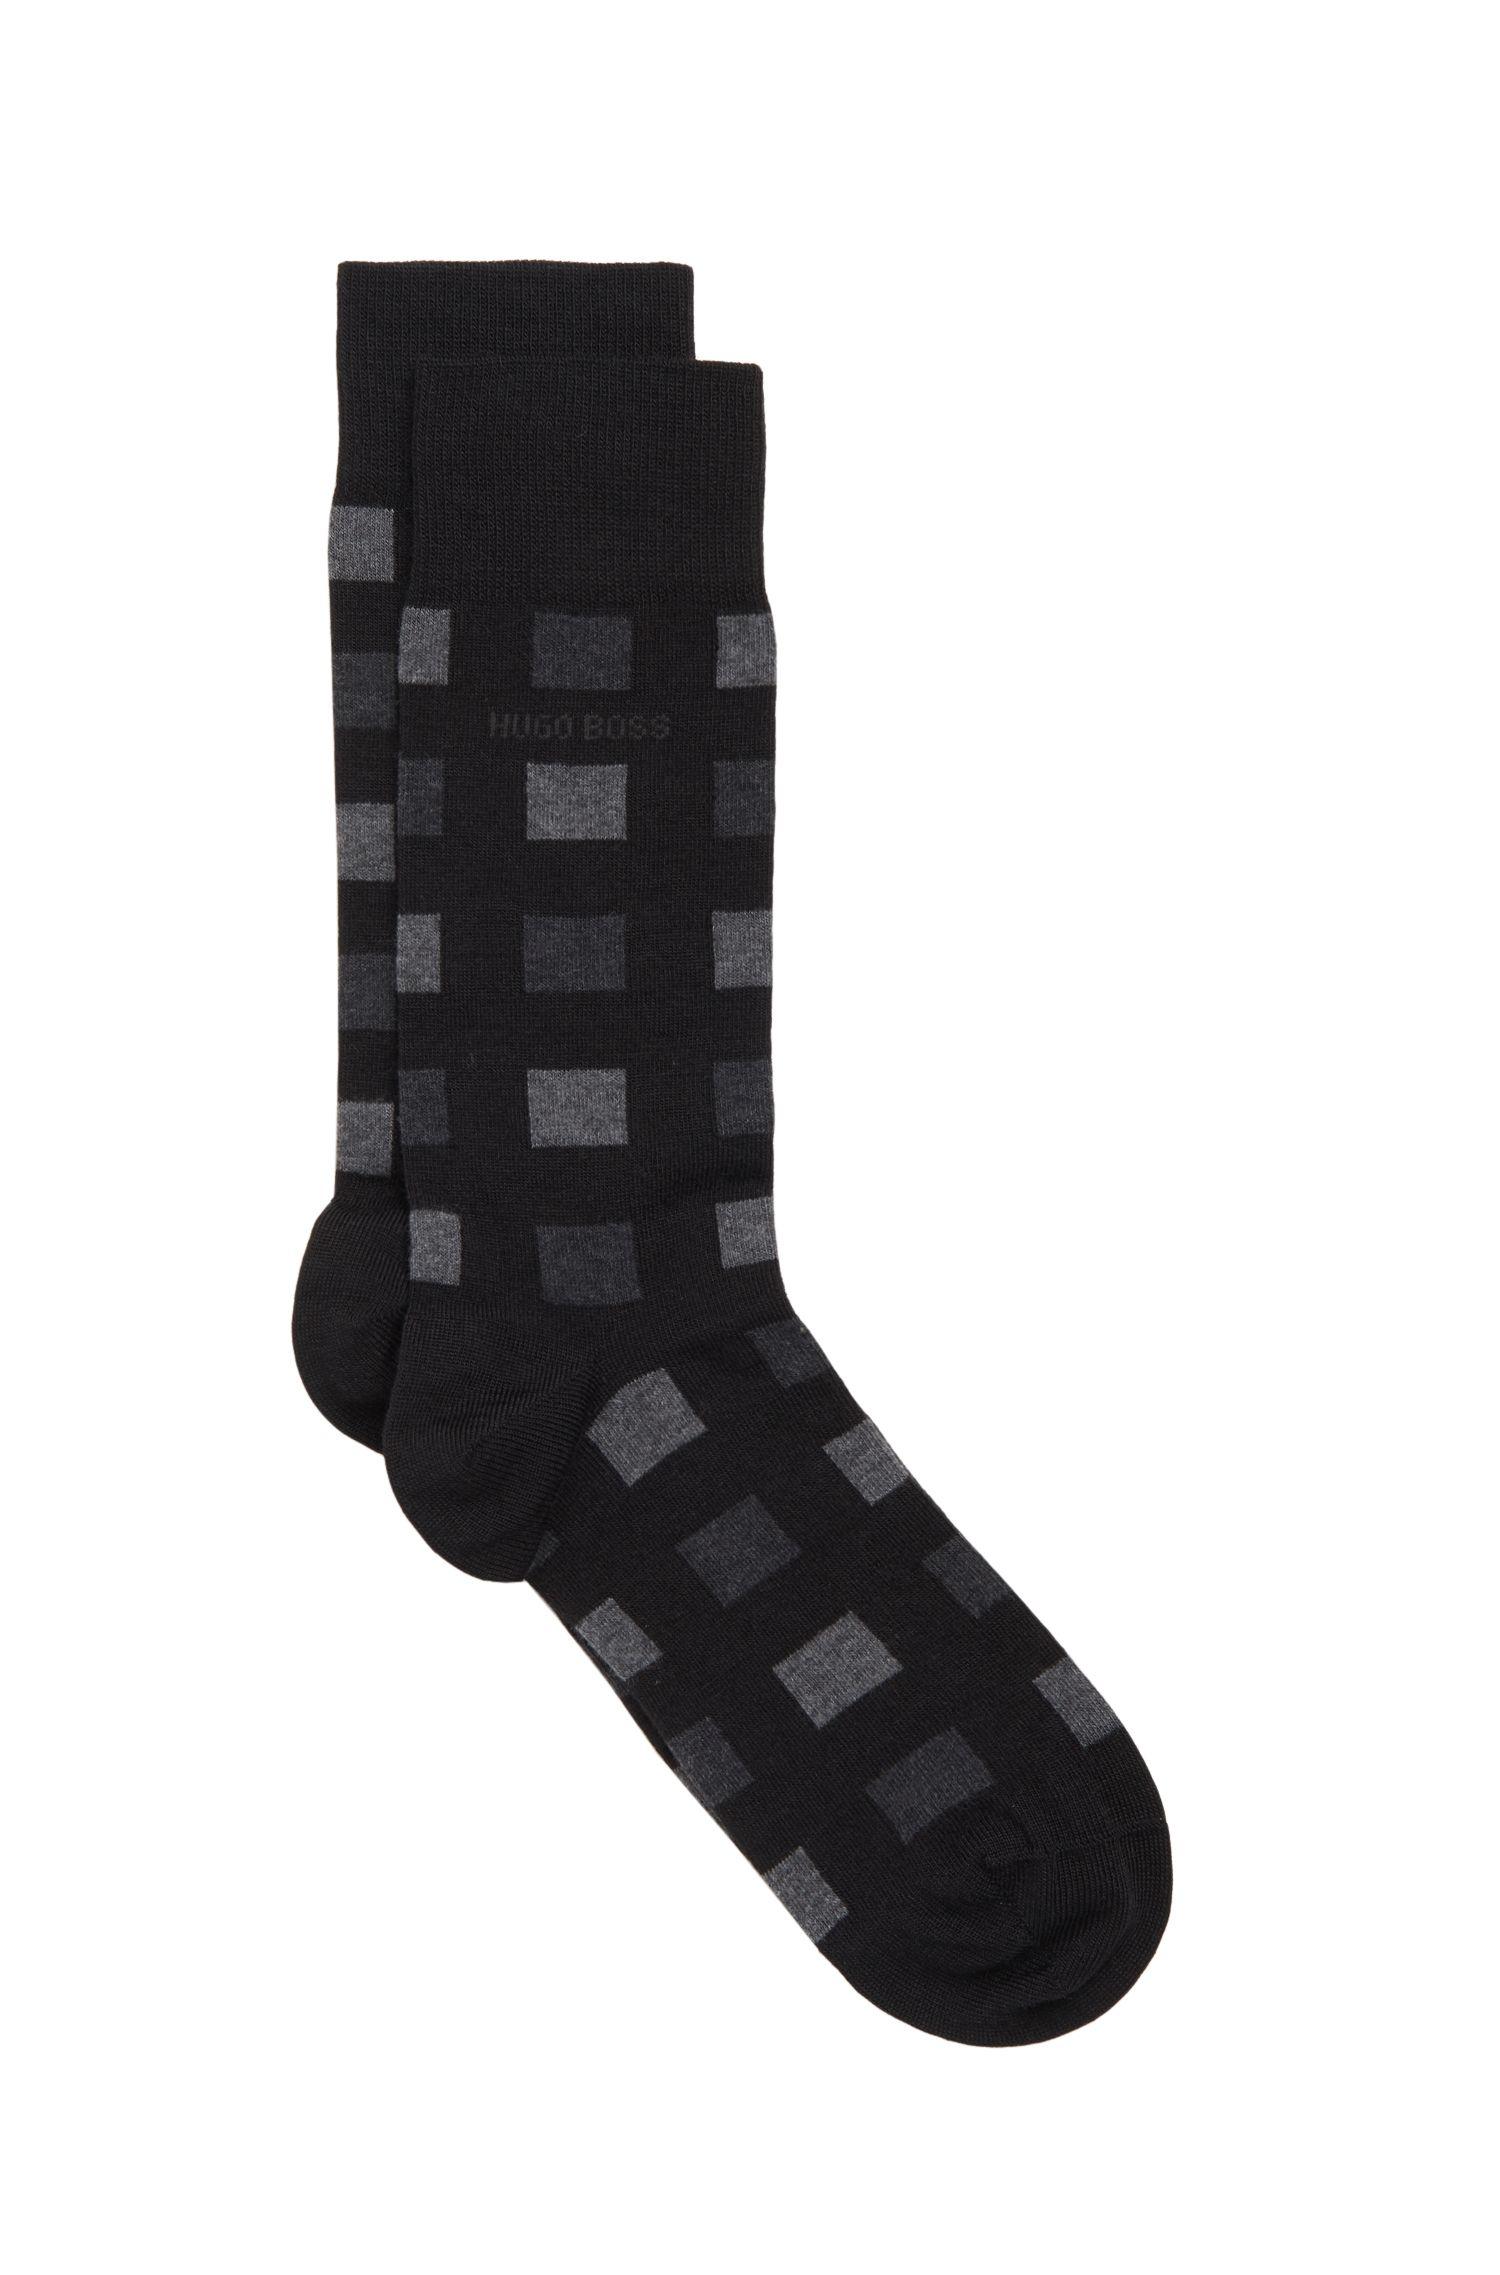 'RS Design US' | Stretch Cotton Wool Blend Socks